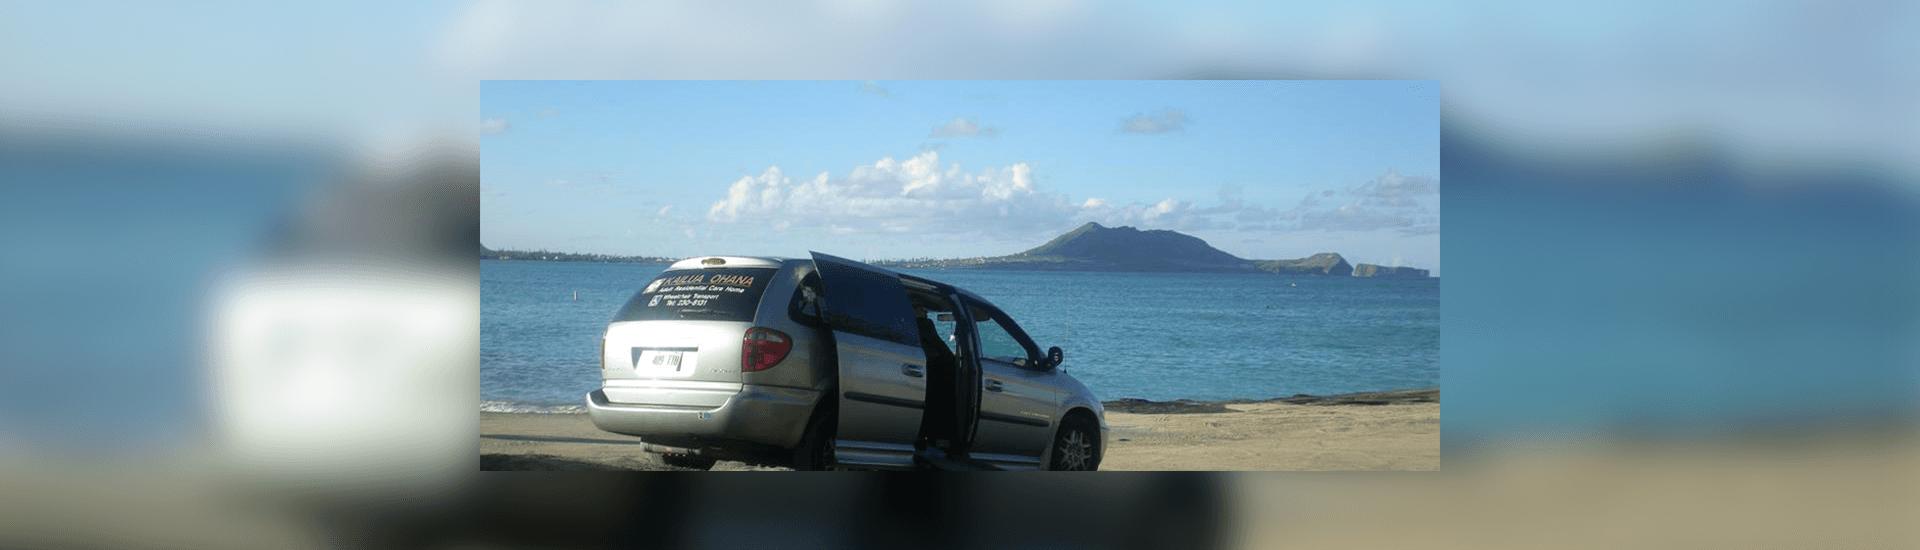 Kailua Ohana Adult Residential Care Home